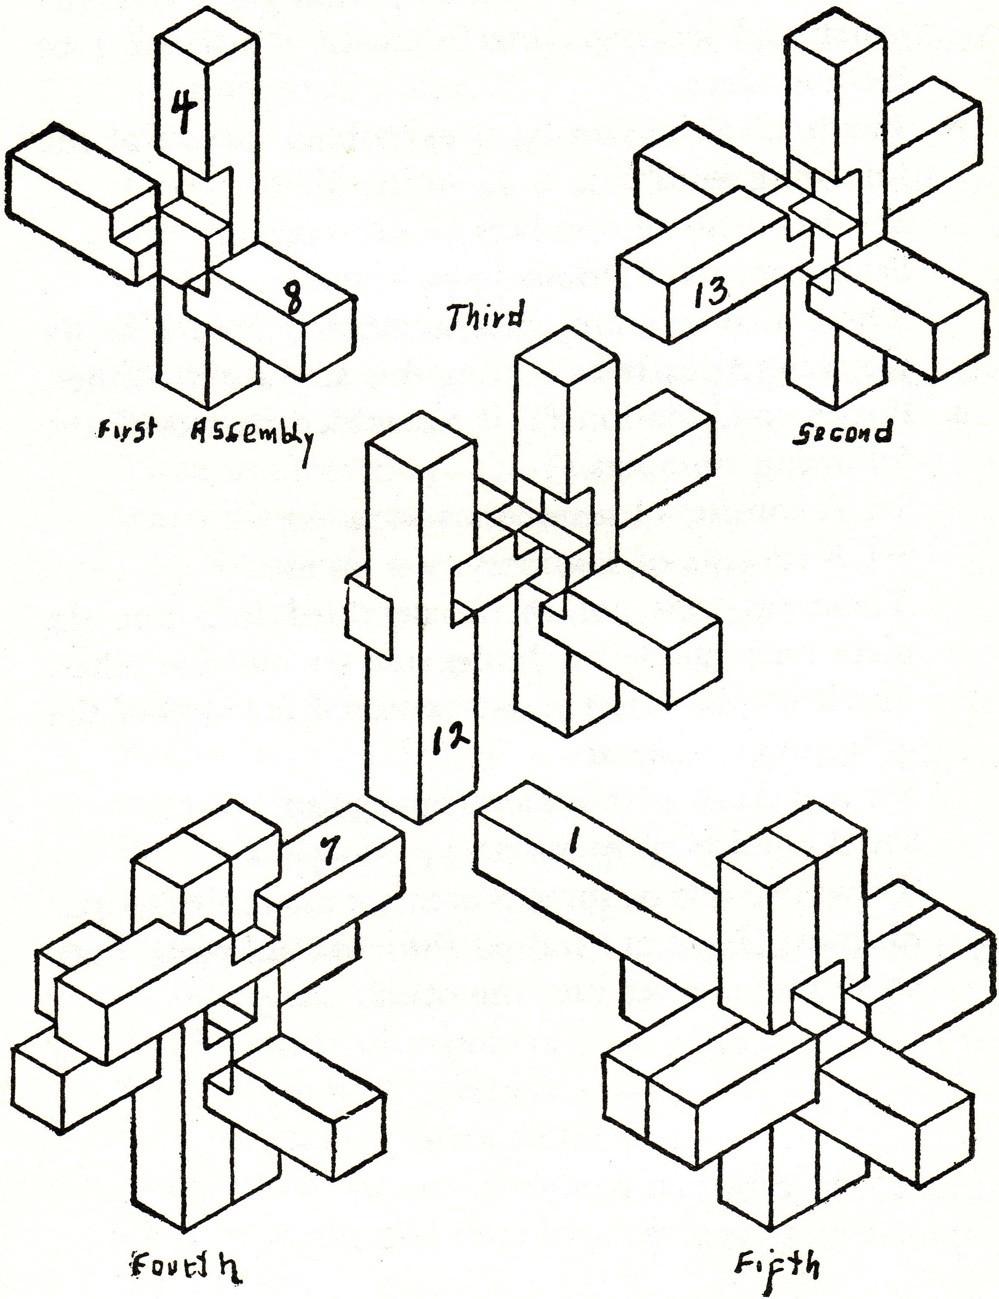 3d wooden puzzles instructions